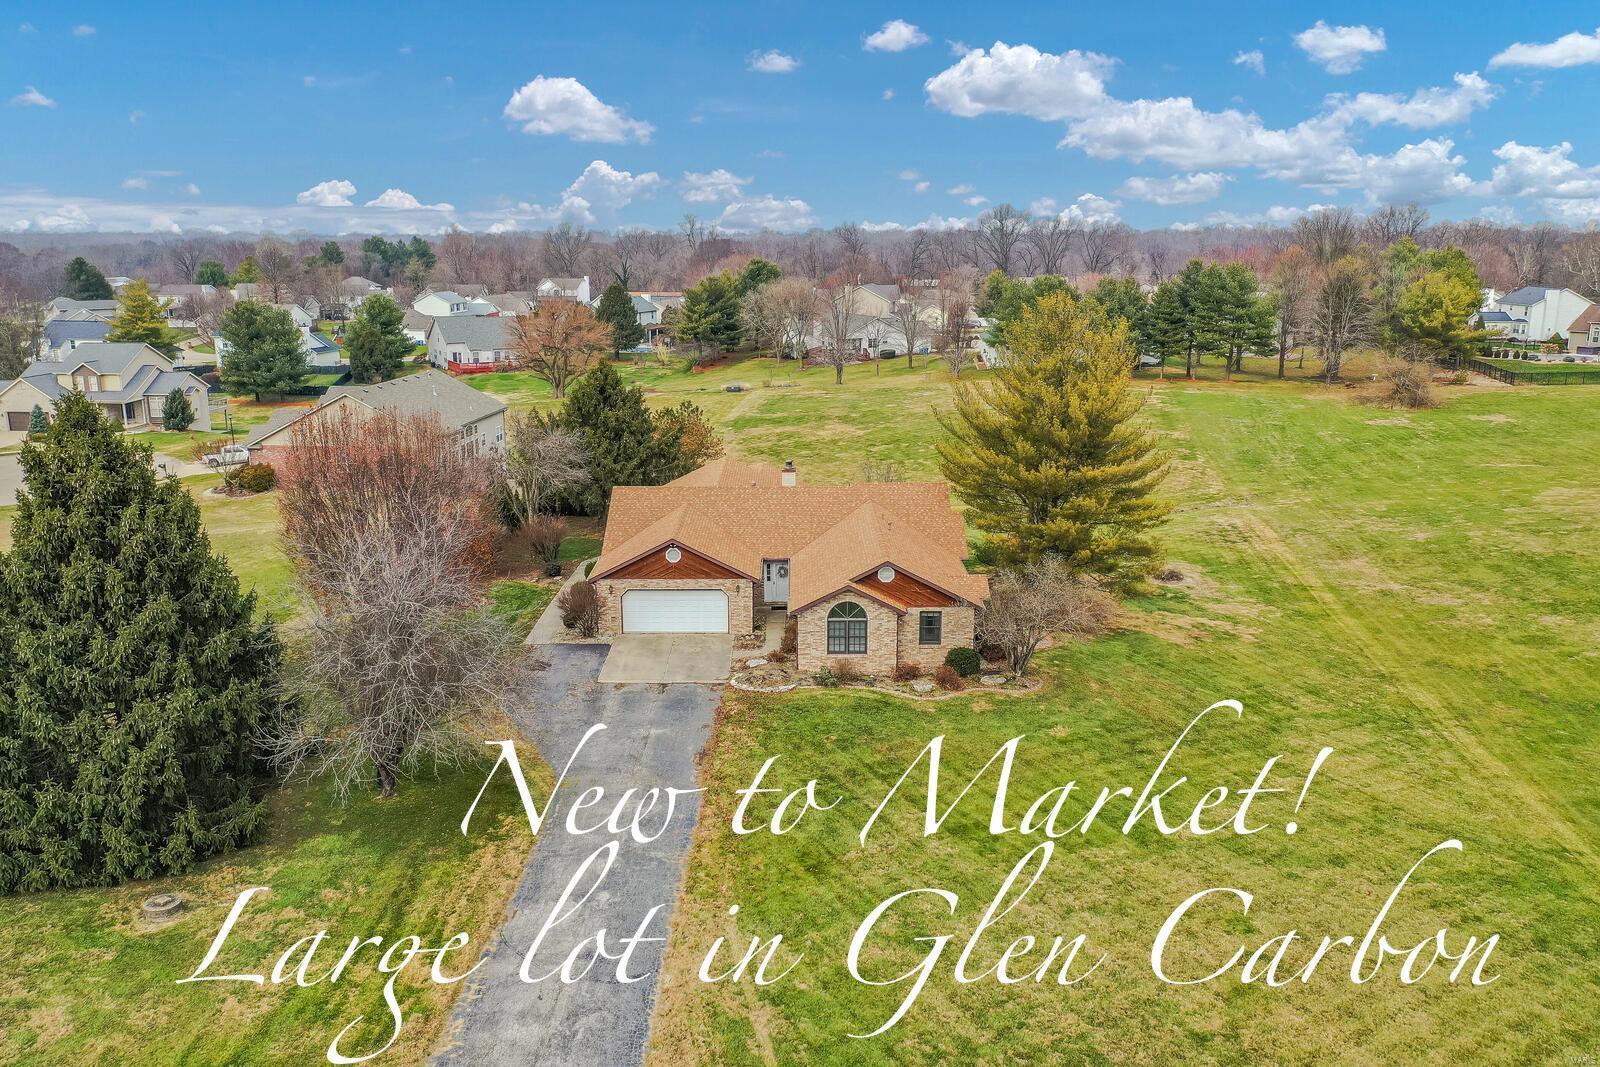 6839 Middlegate Lane Property Photo - Glen Carbon, IL real estate listing